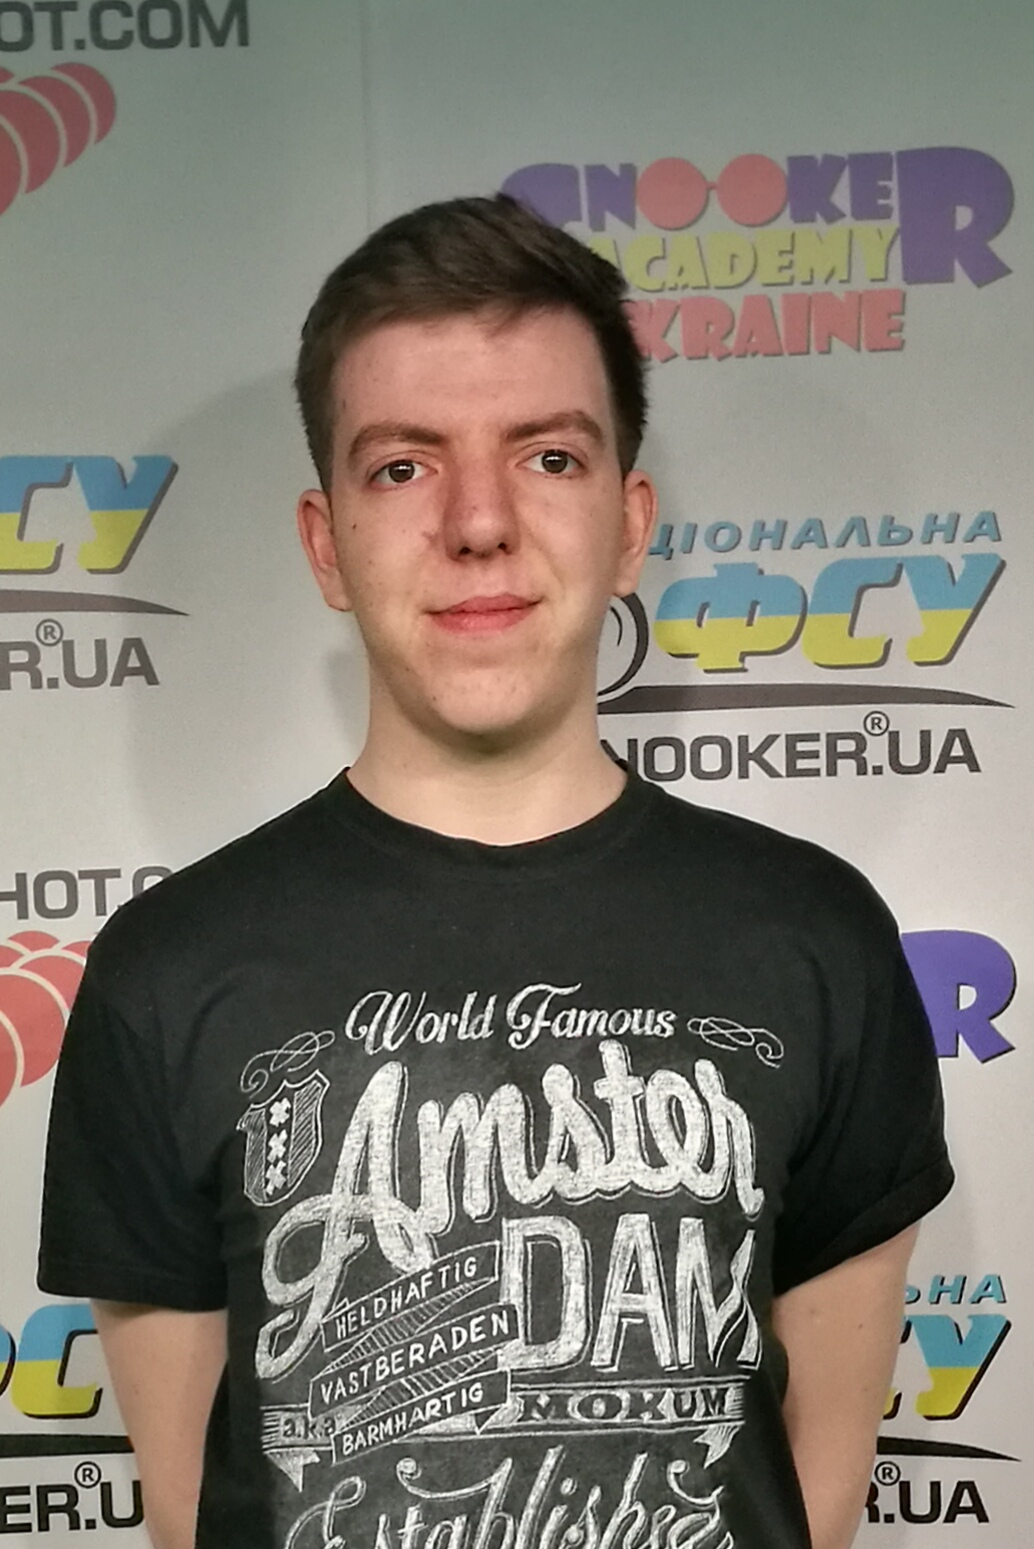 Voloshko Roman